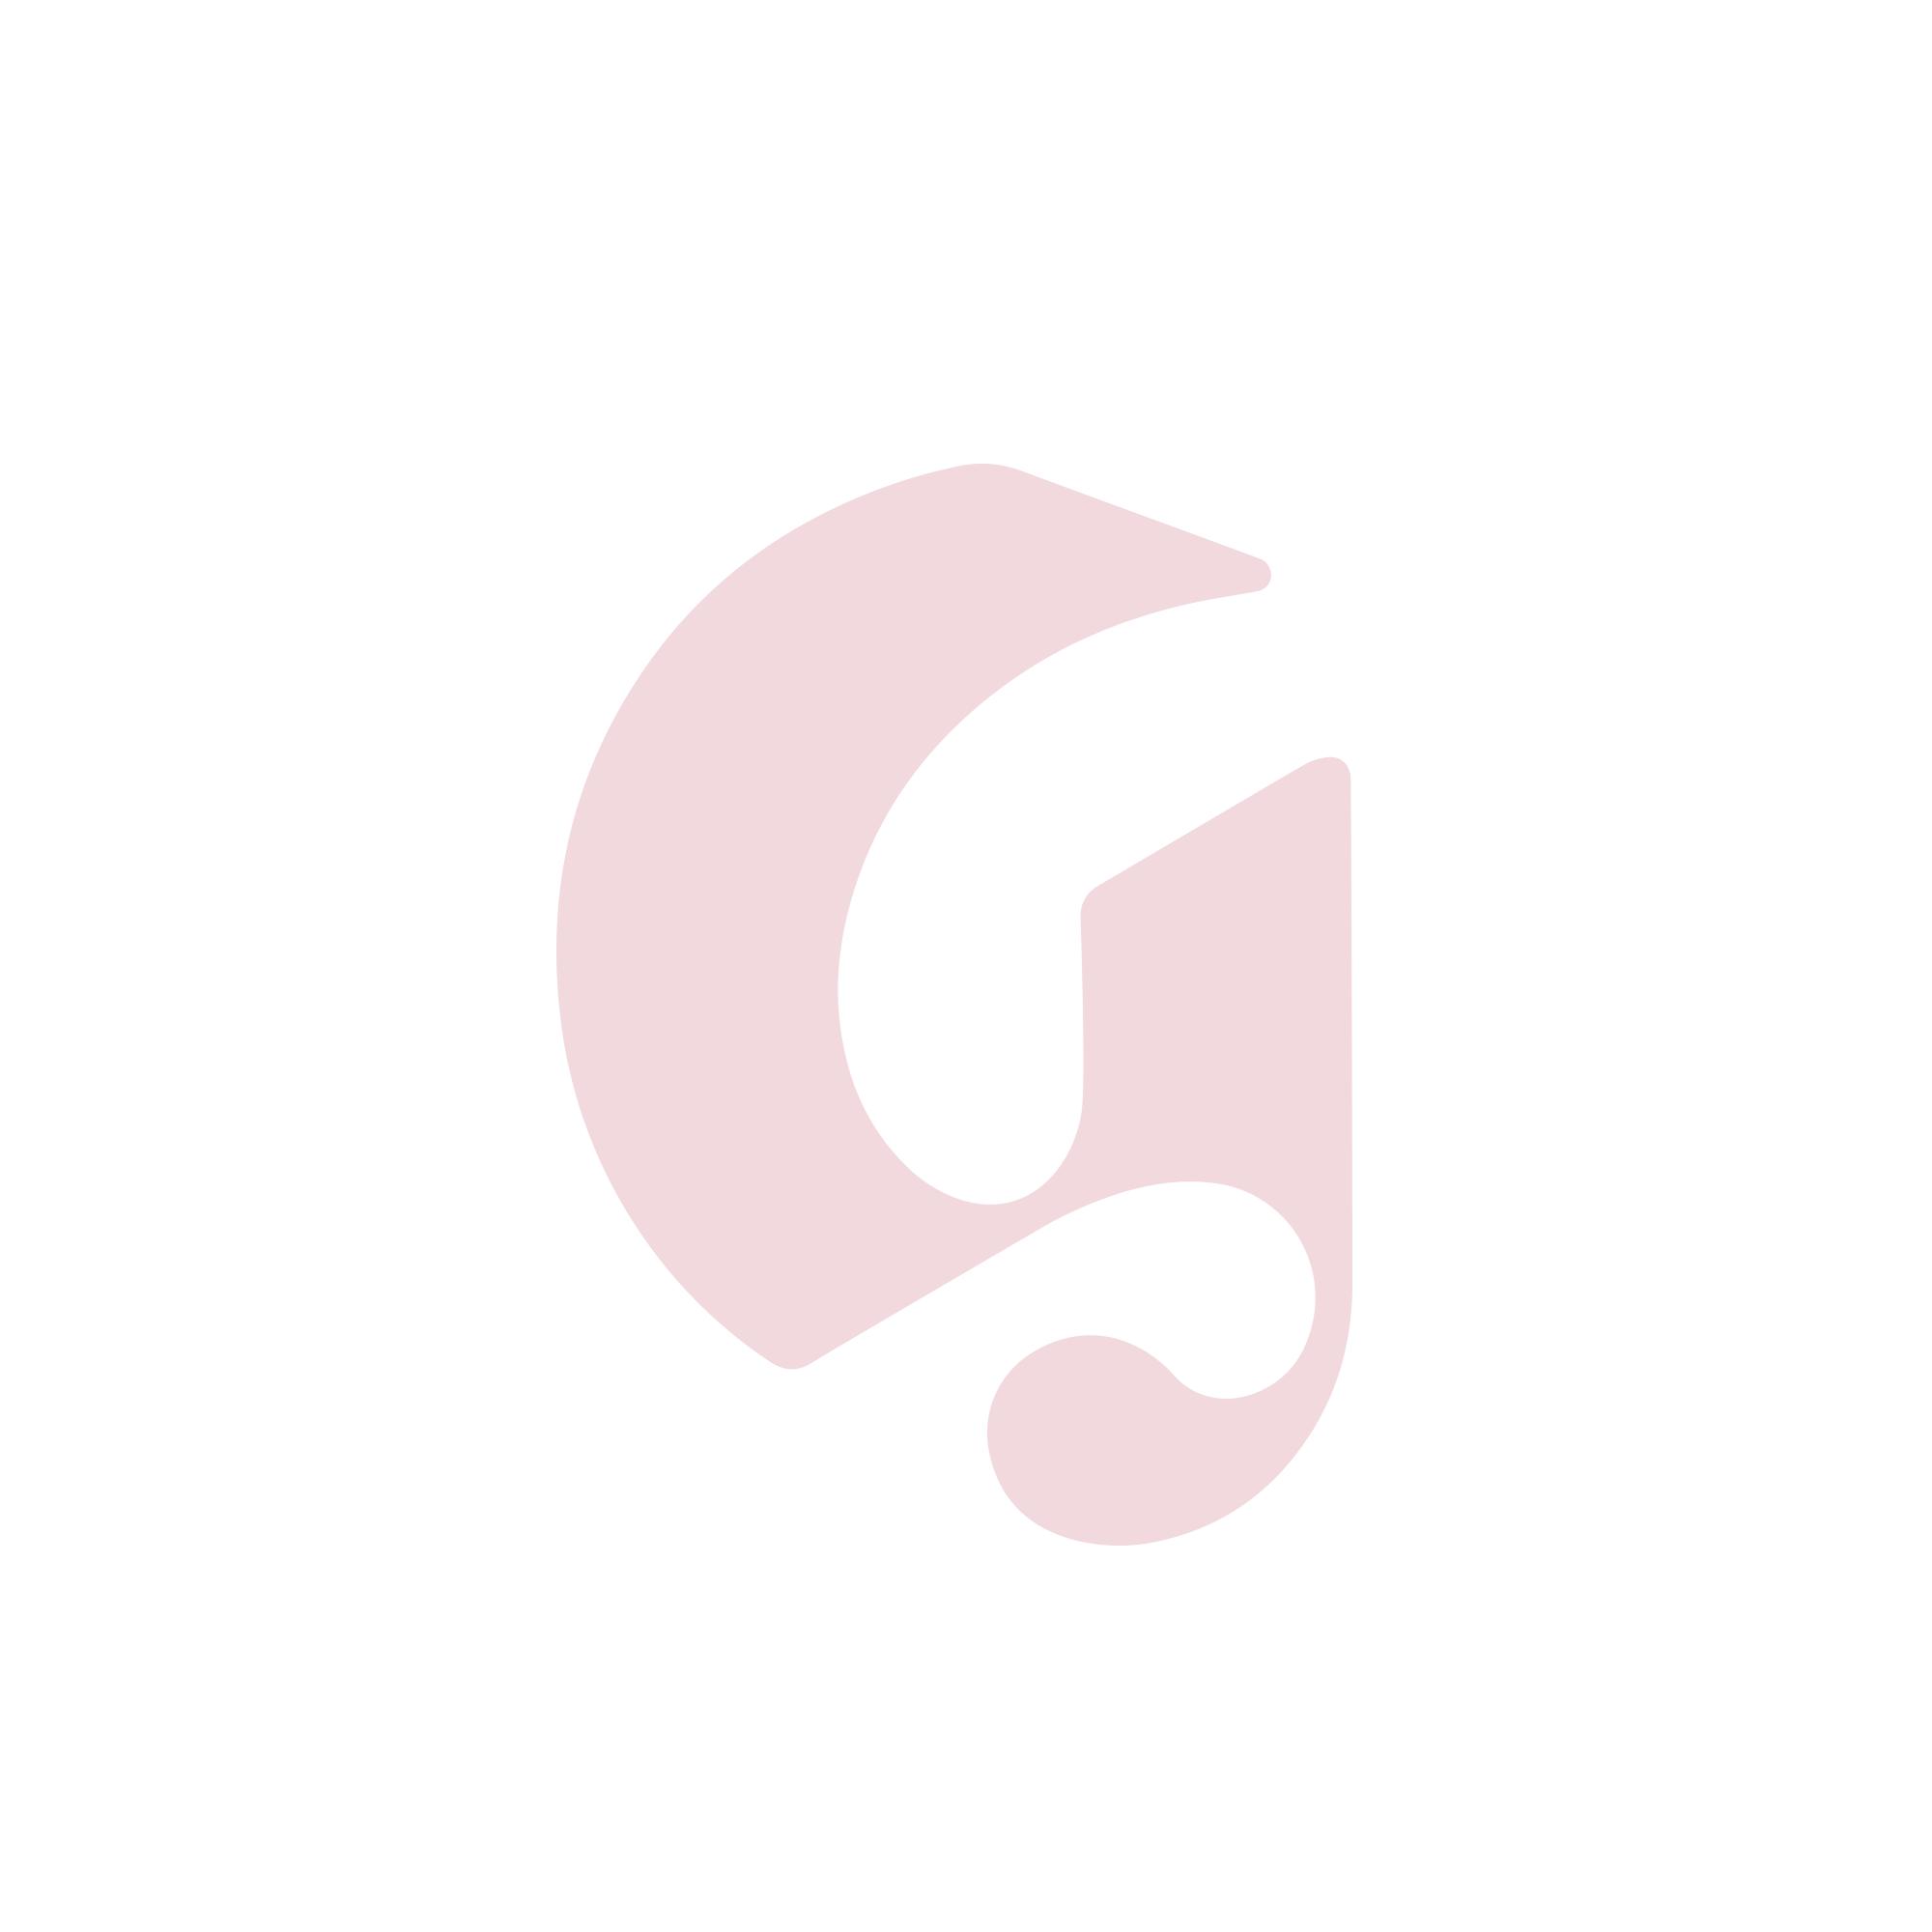 Glossier logo - United States   Glossier logo, Glossier branding, Logo  design creative